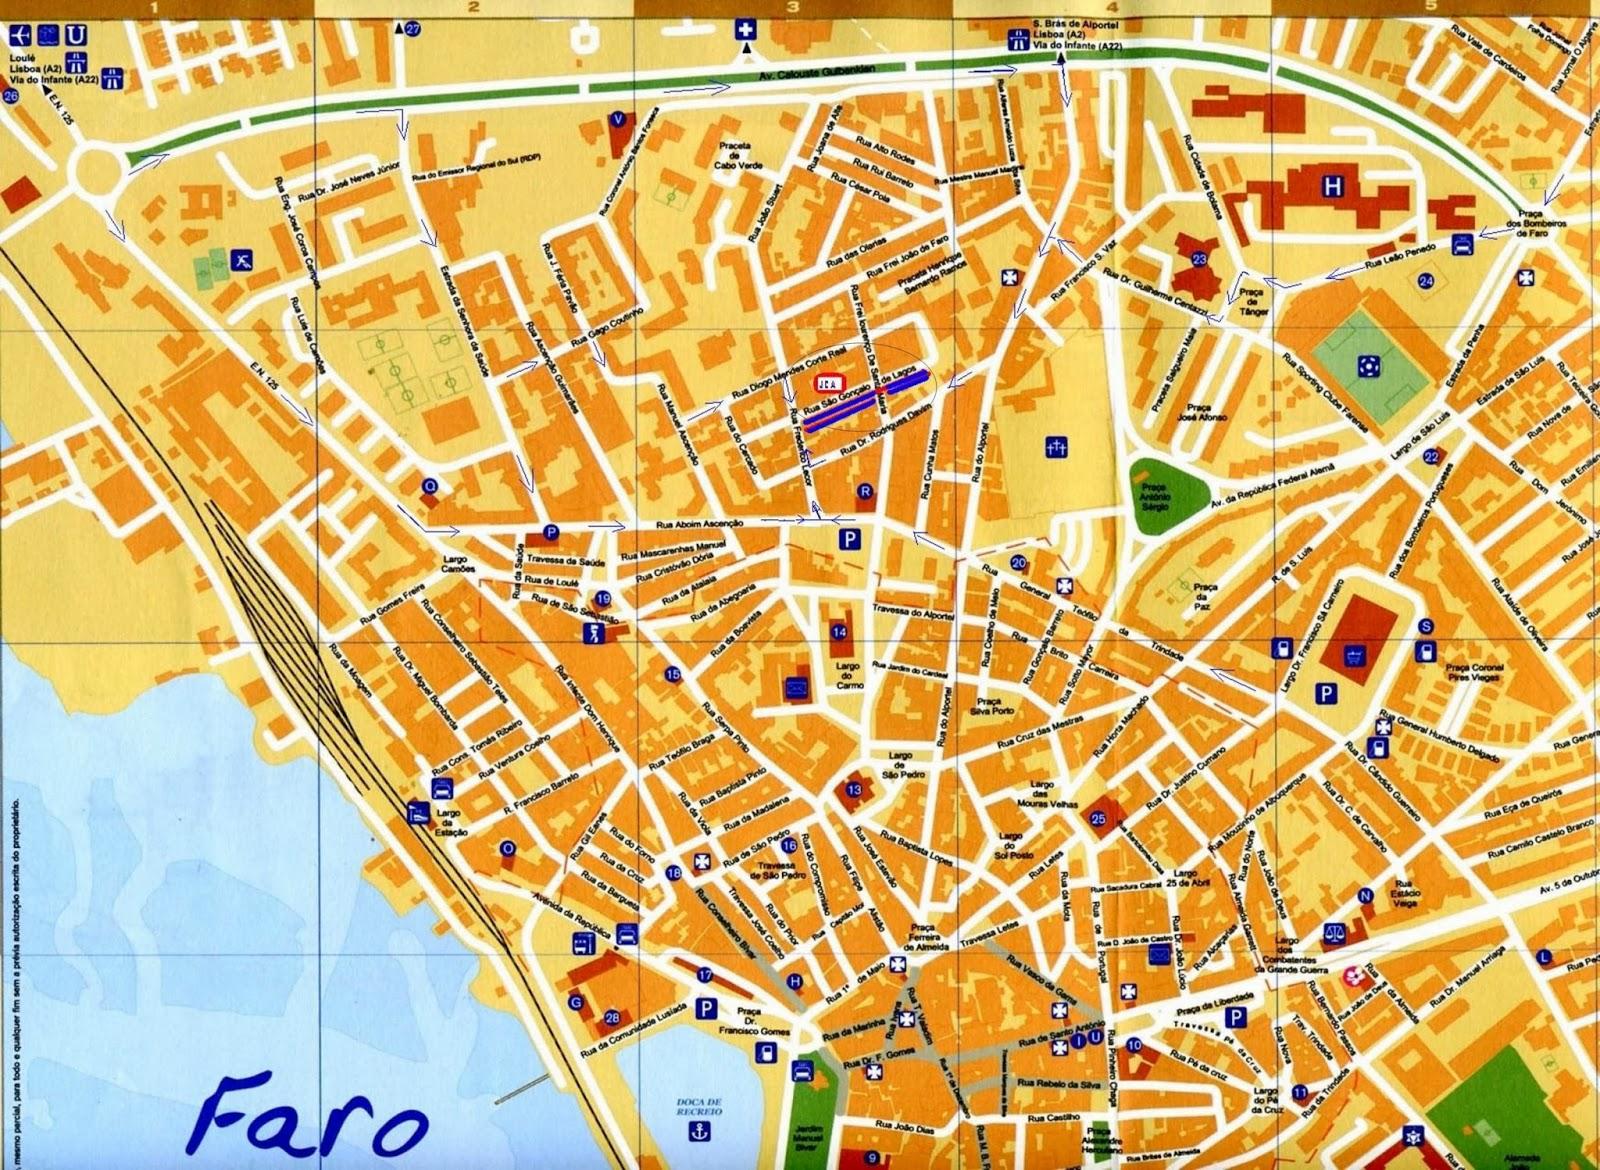 mapa de portugal continental praias Mapas de Faro   Portugal | MapasBlog mapa de portugal continental praias